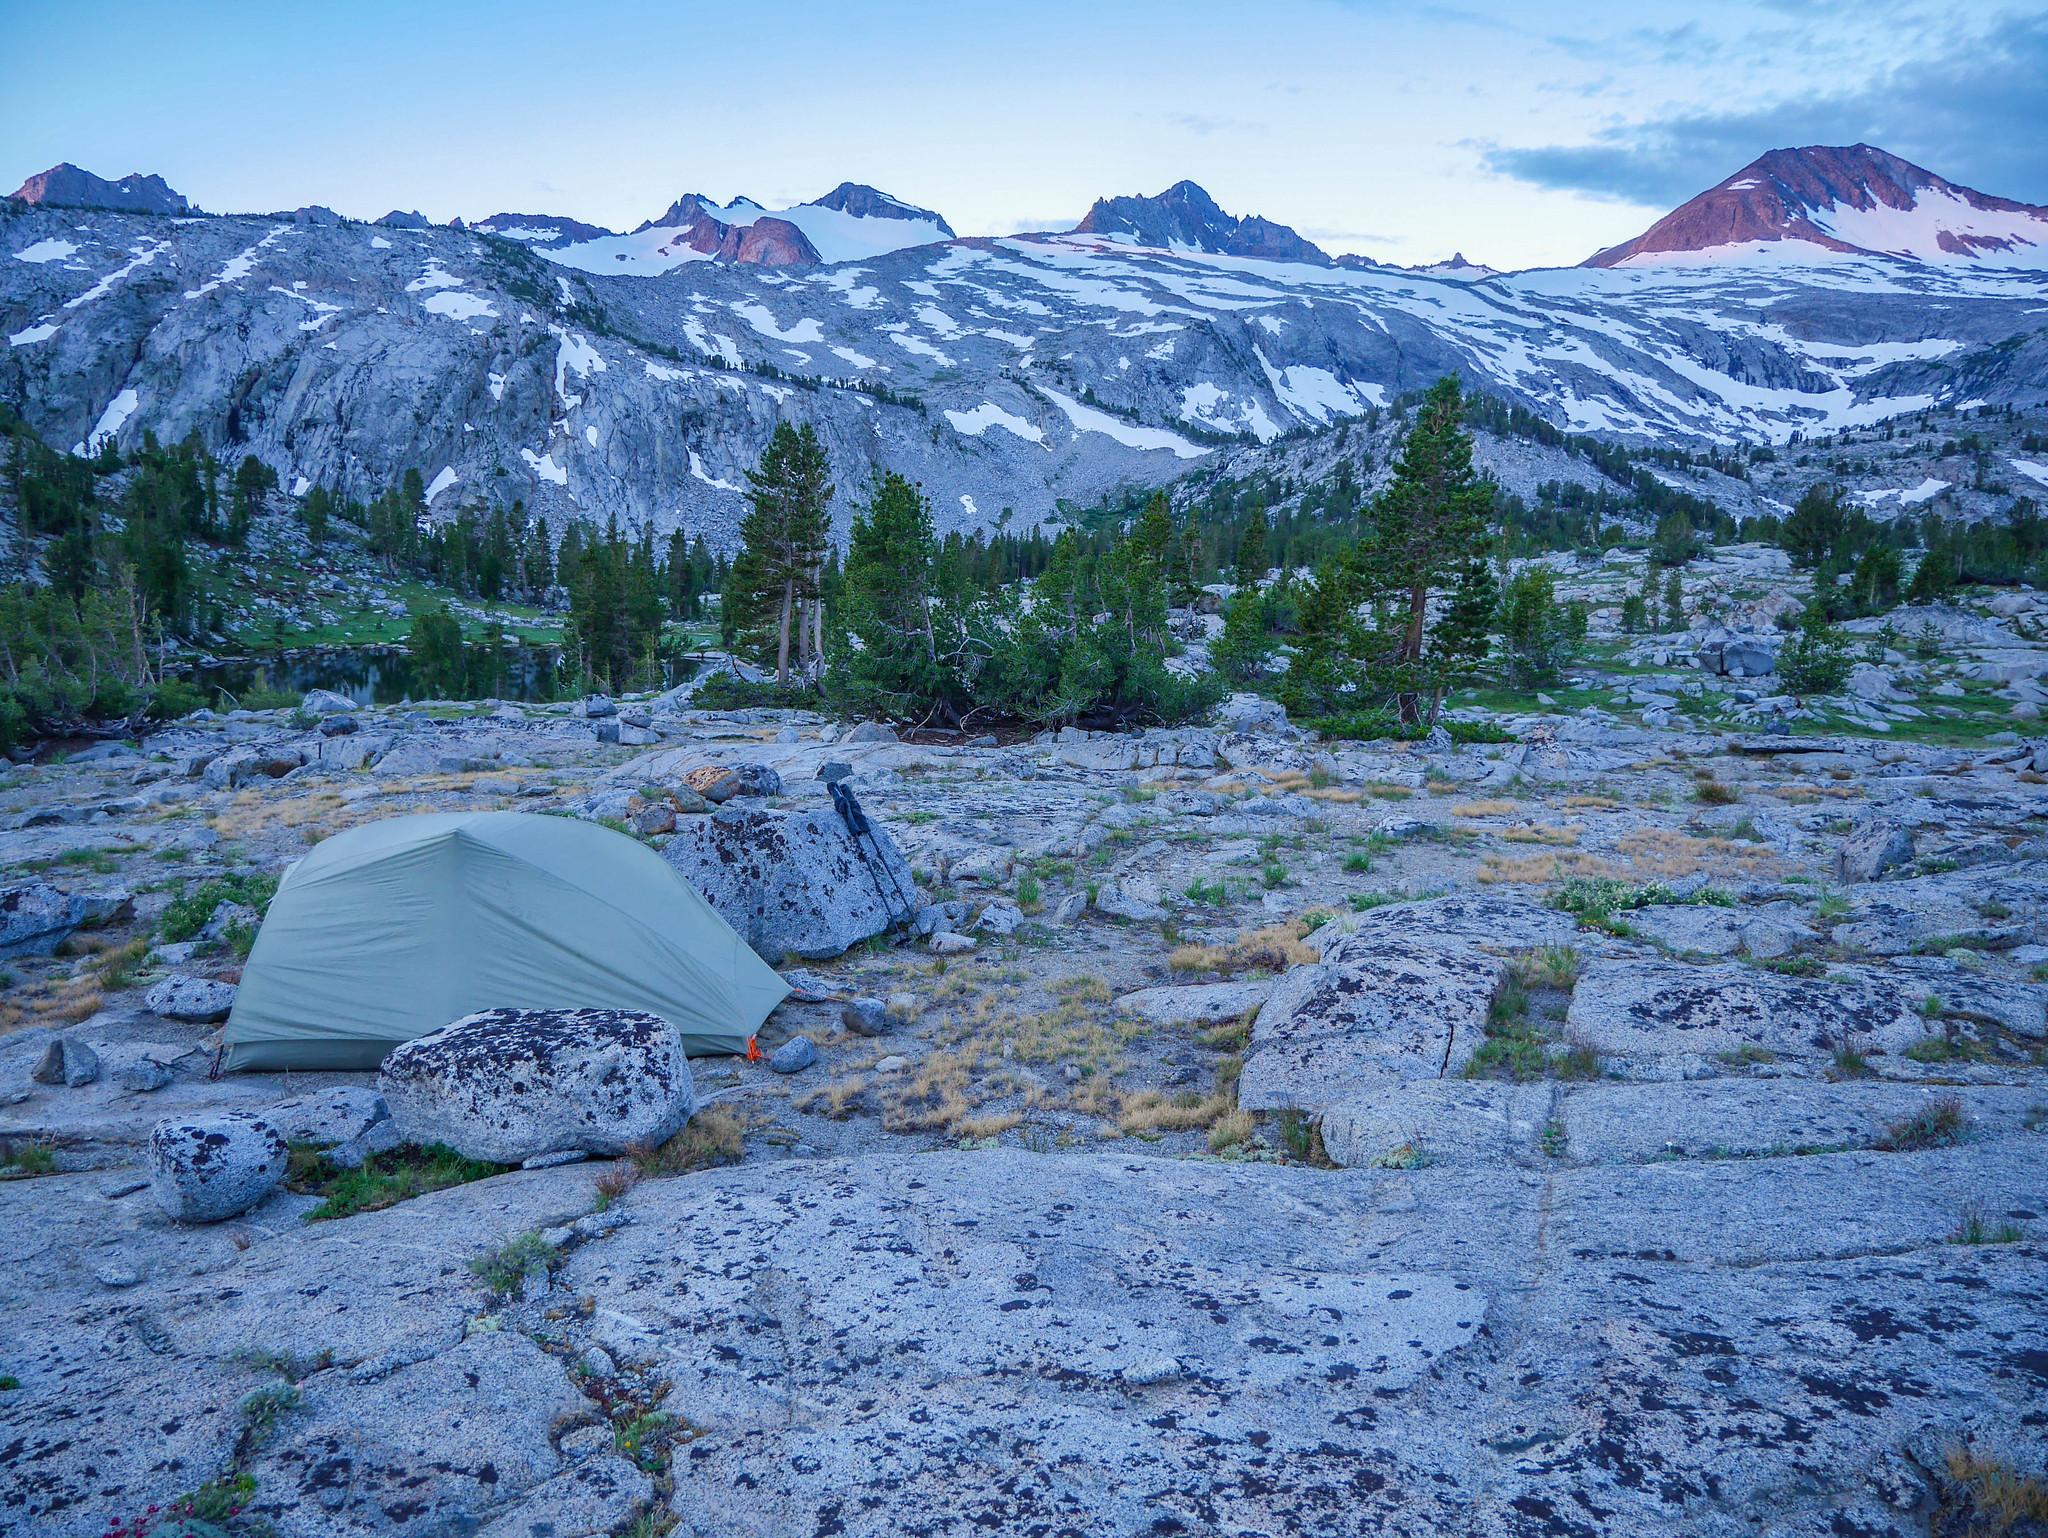 Camp in McClure Creek drainage